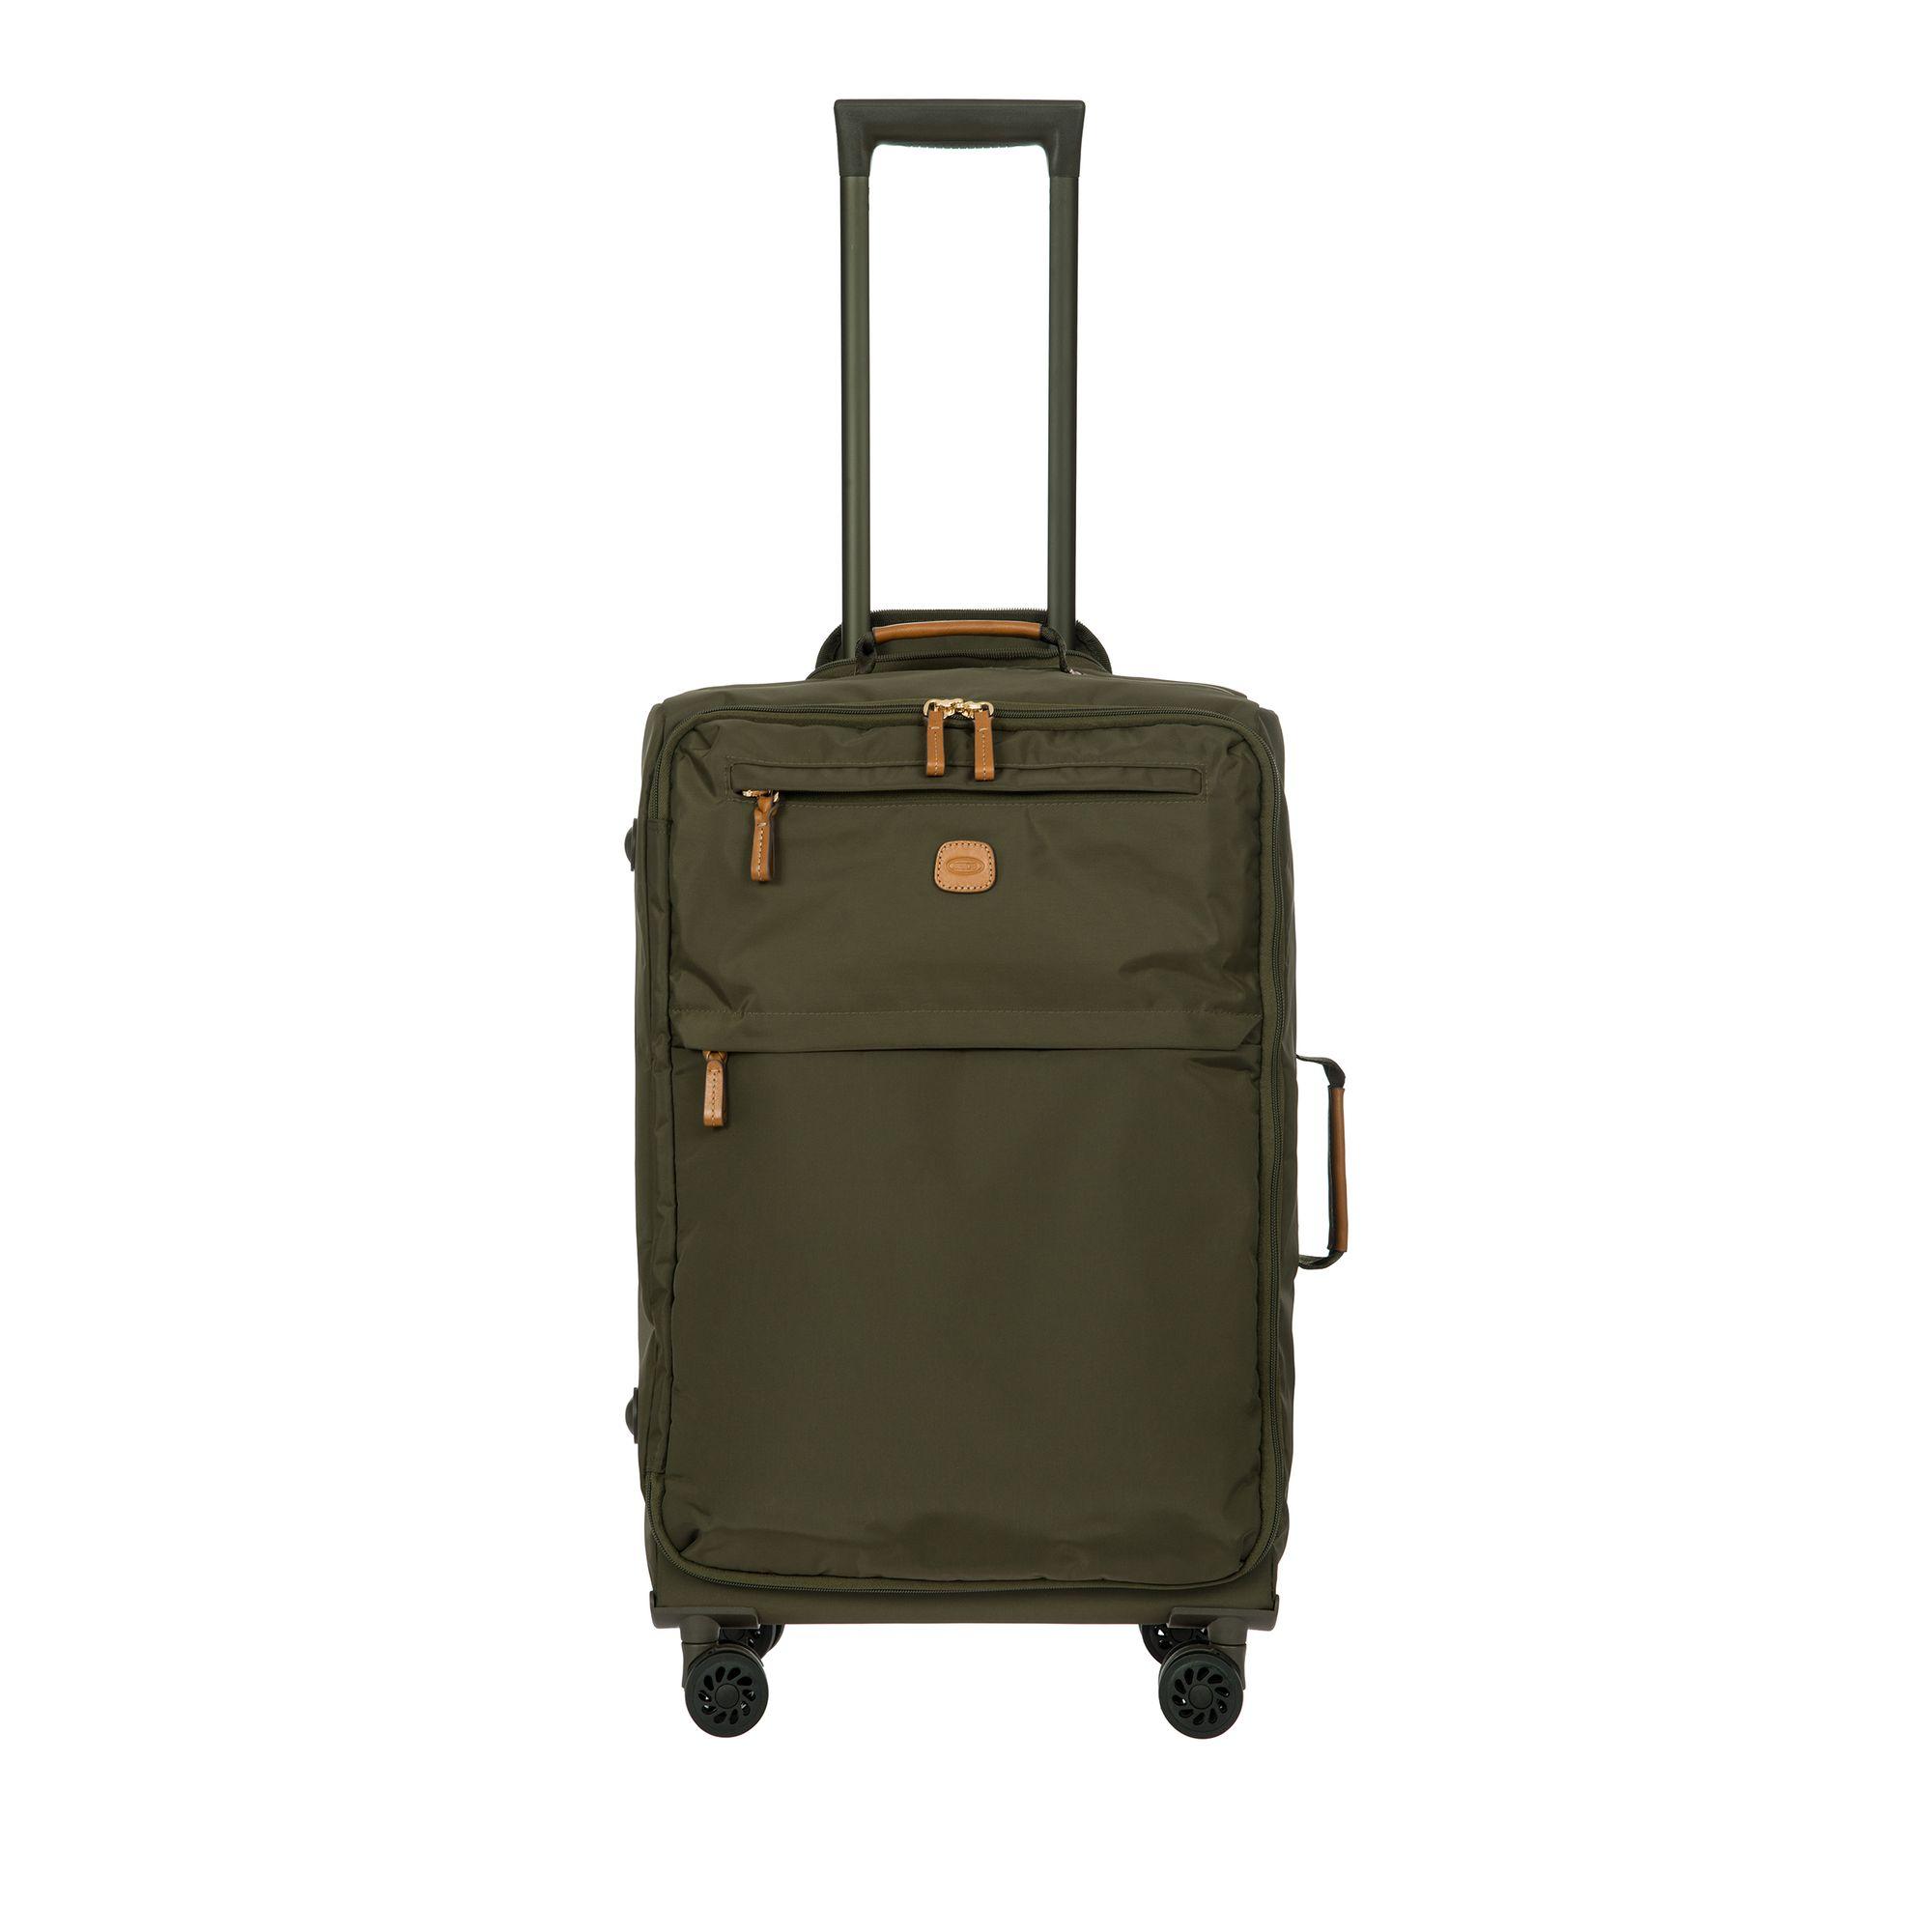 BRIC'S X-Travel mjuk resväska i nylon, 4 hjul, 65 cm, Grön